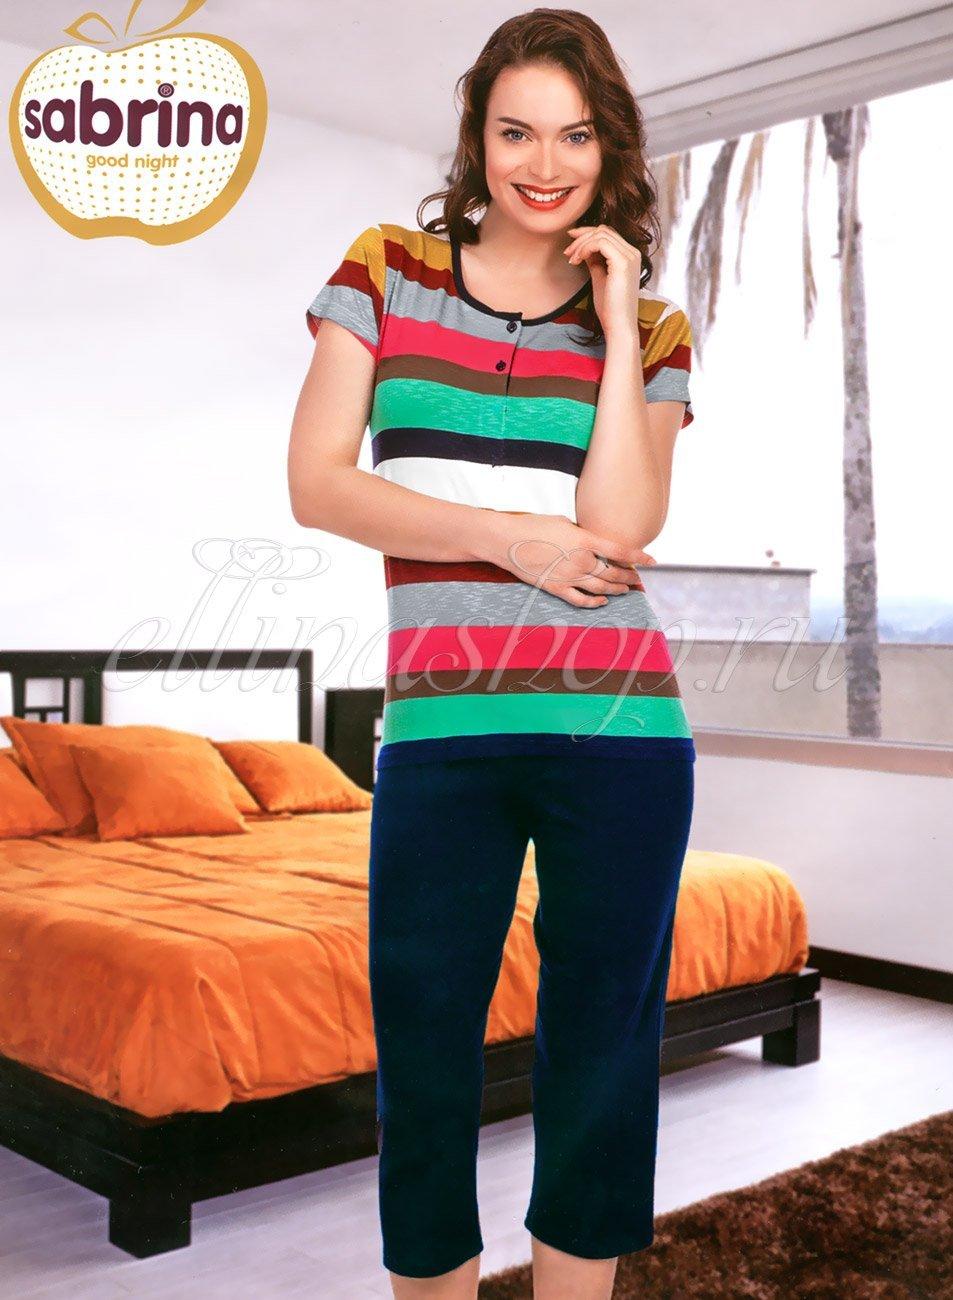 58001 Полоска Комплект (футболка+бриджи) Sabrina